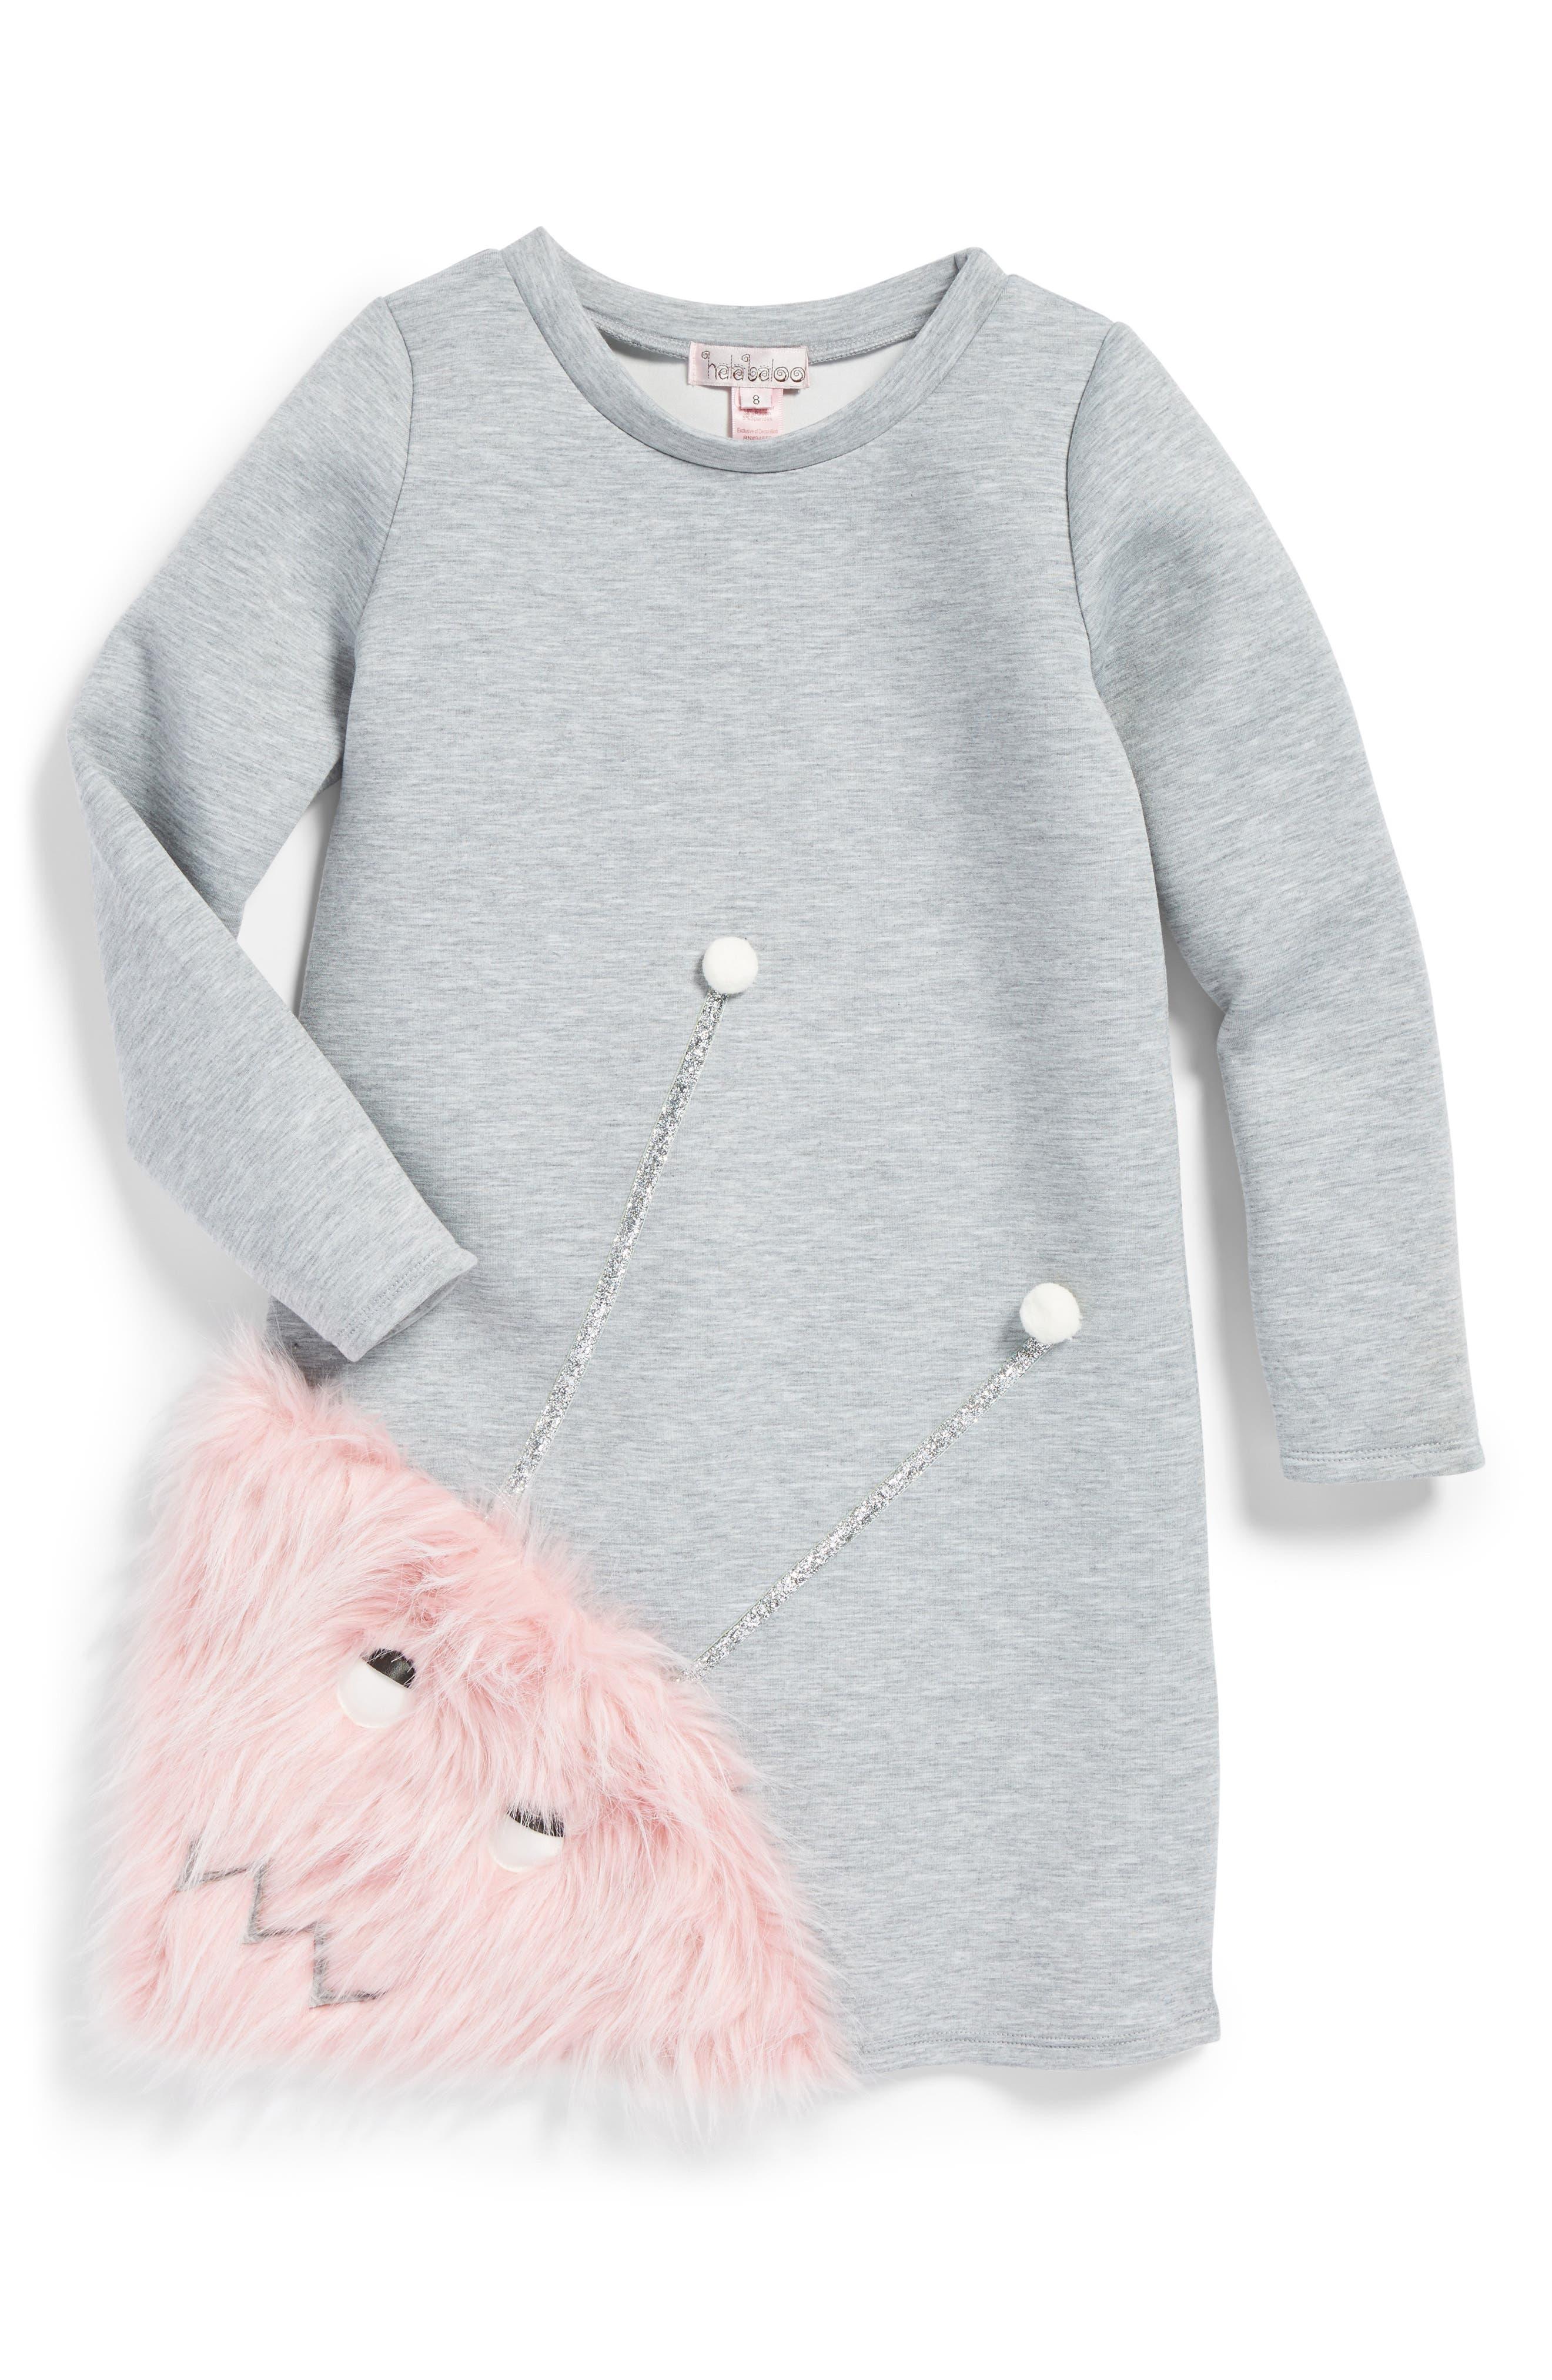 Alternate Image 1 Selected - Halabaloo Monster Dress (Toddler Girls, Little Girls & Big Girls)